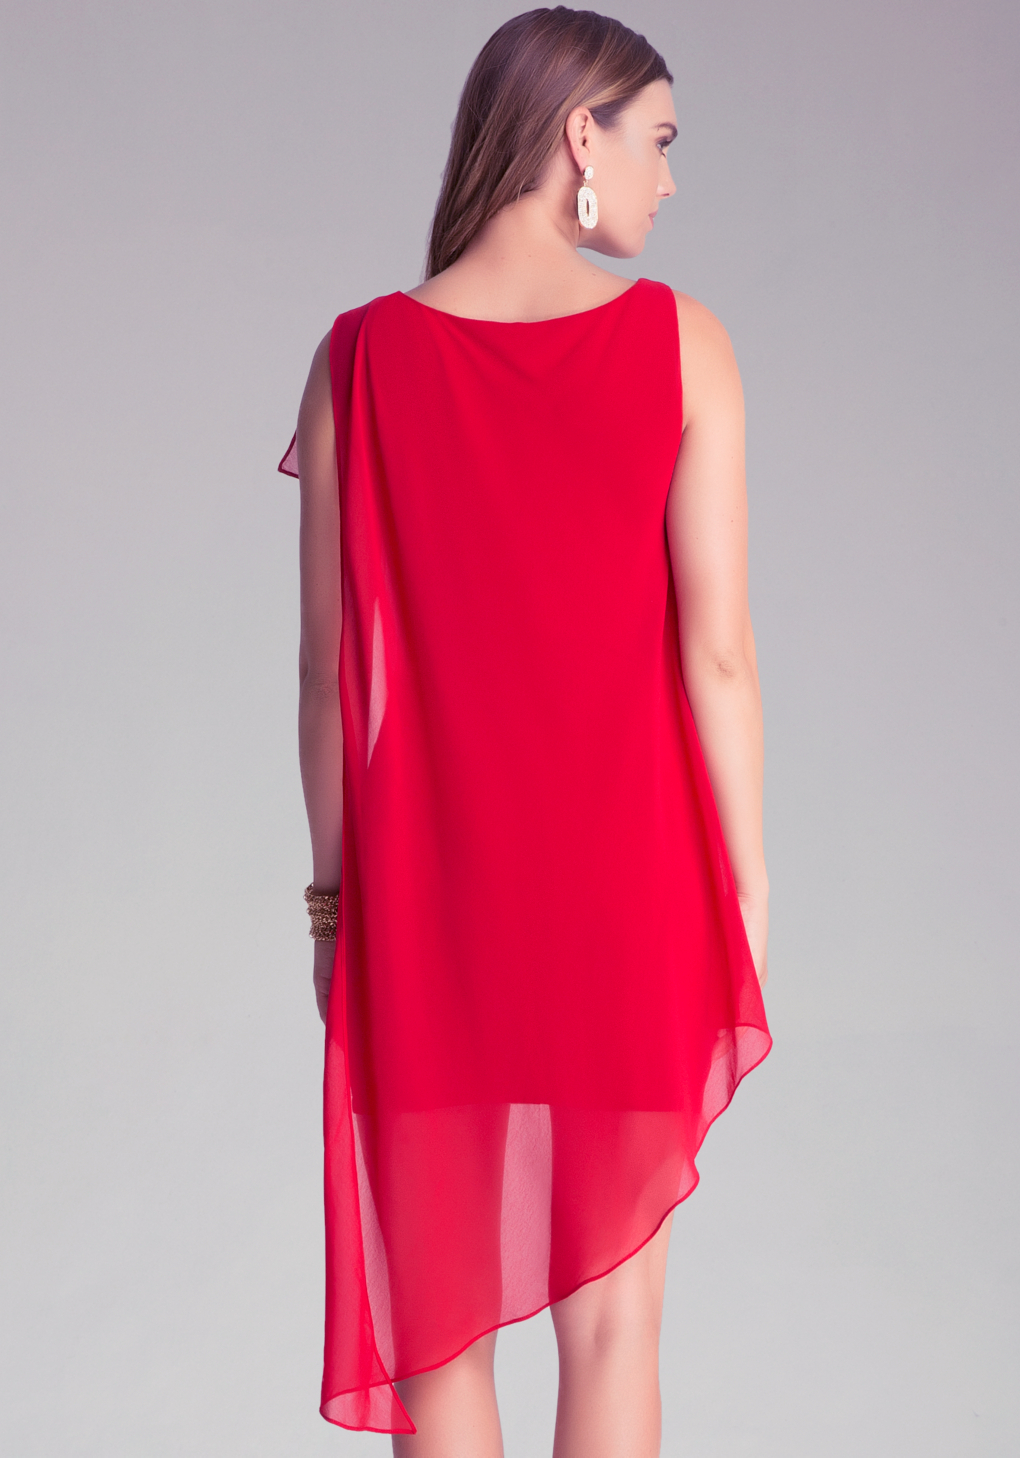 Lyst bebe asymmetric drape dress in red for Bebe dresses wedding guest